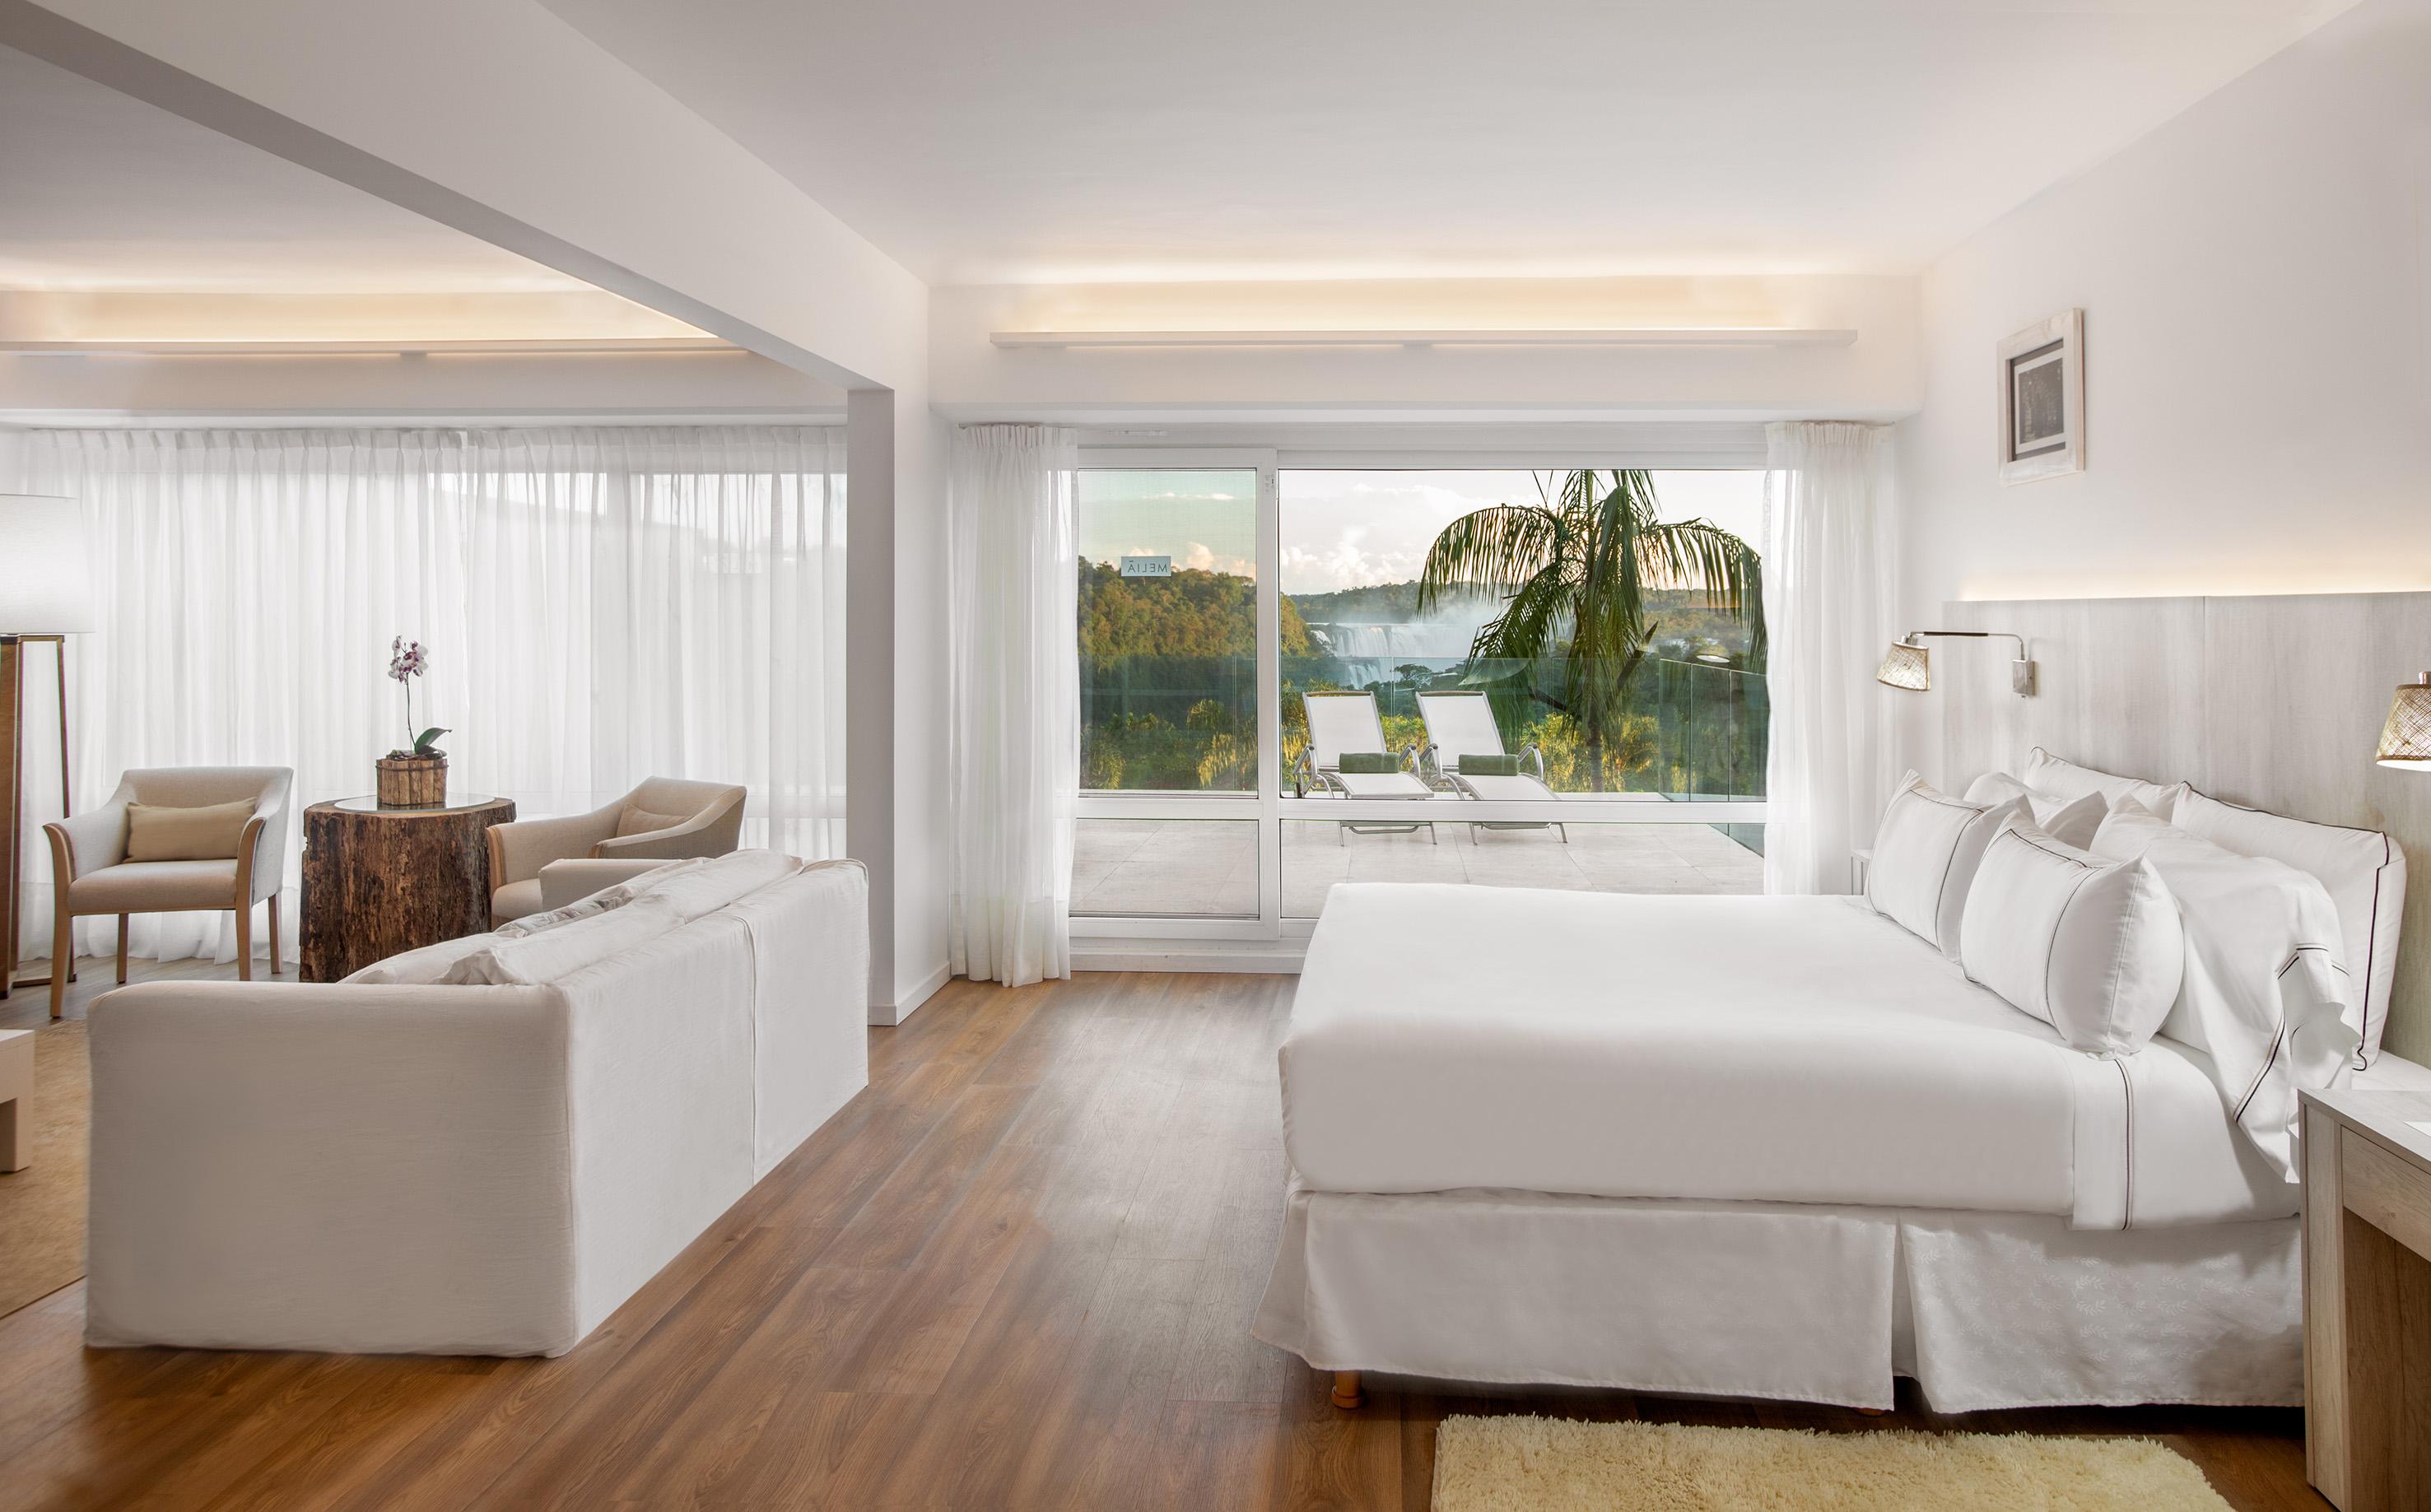 Rundreise - 119bGranMeliaIguazu-Suite_Terrace.jpg